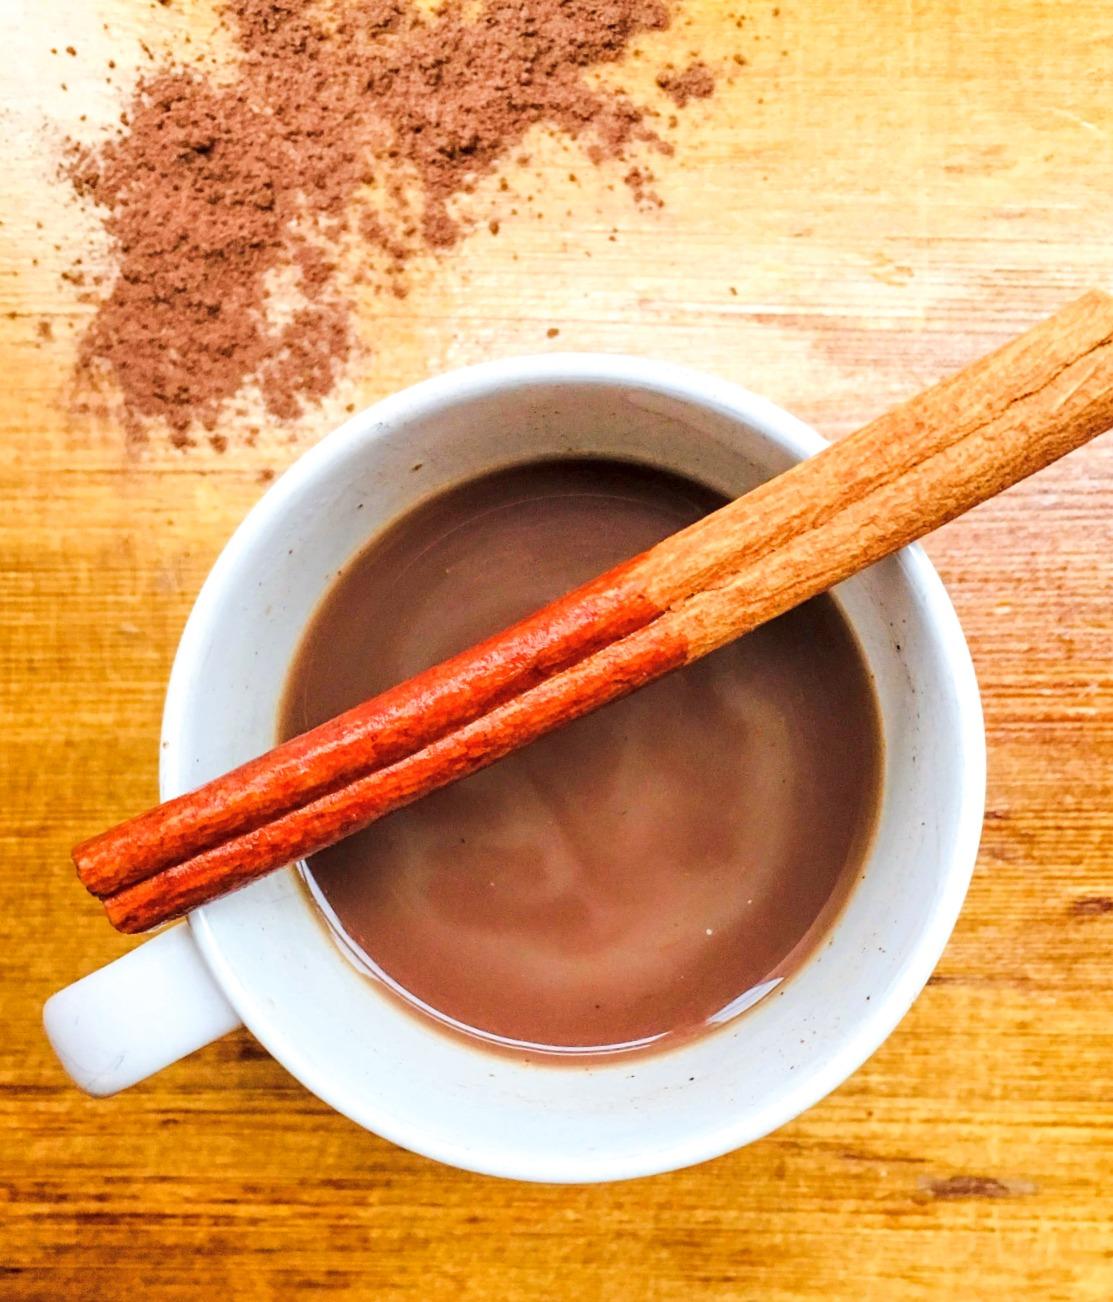 spiced cocoa tea with a cinnamon stick